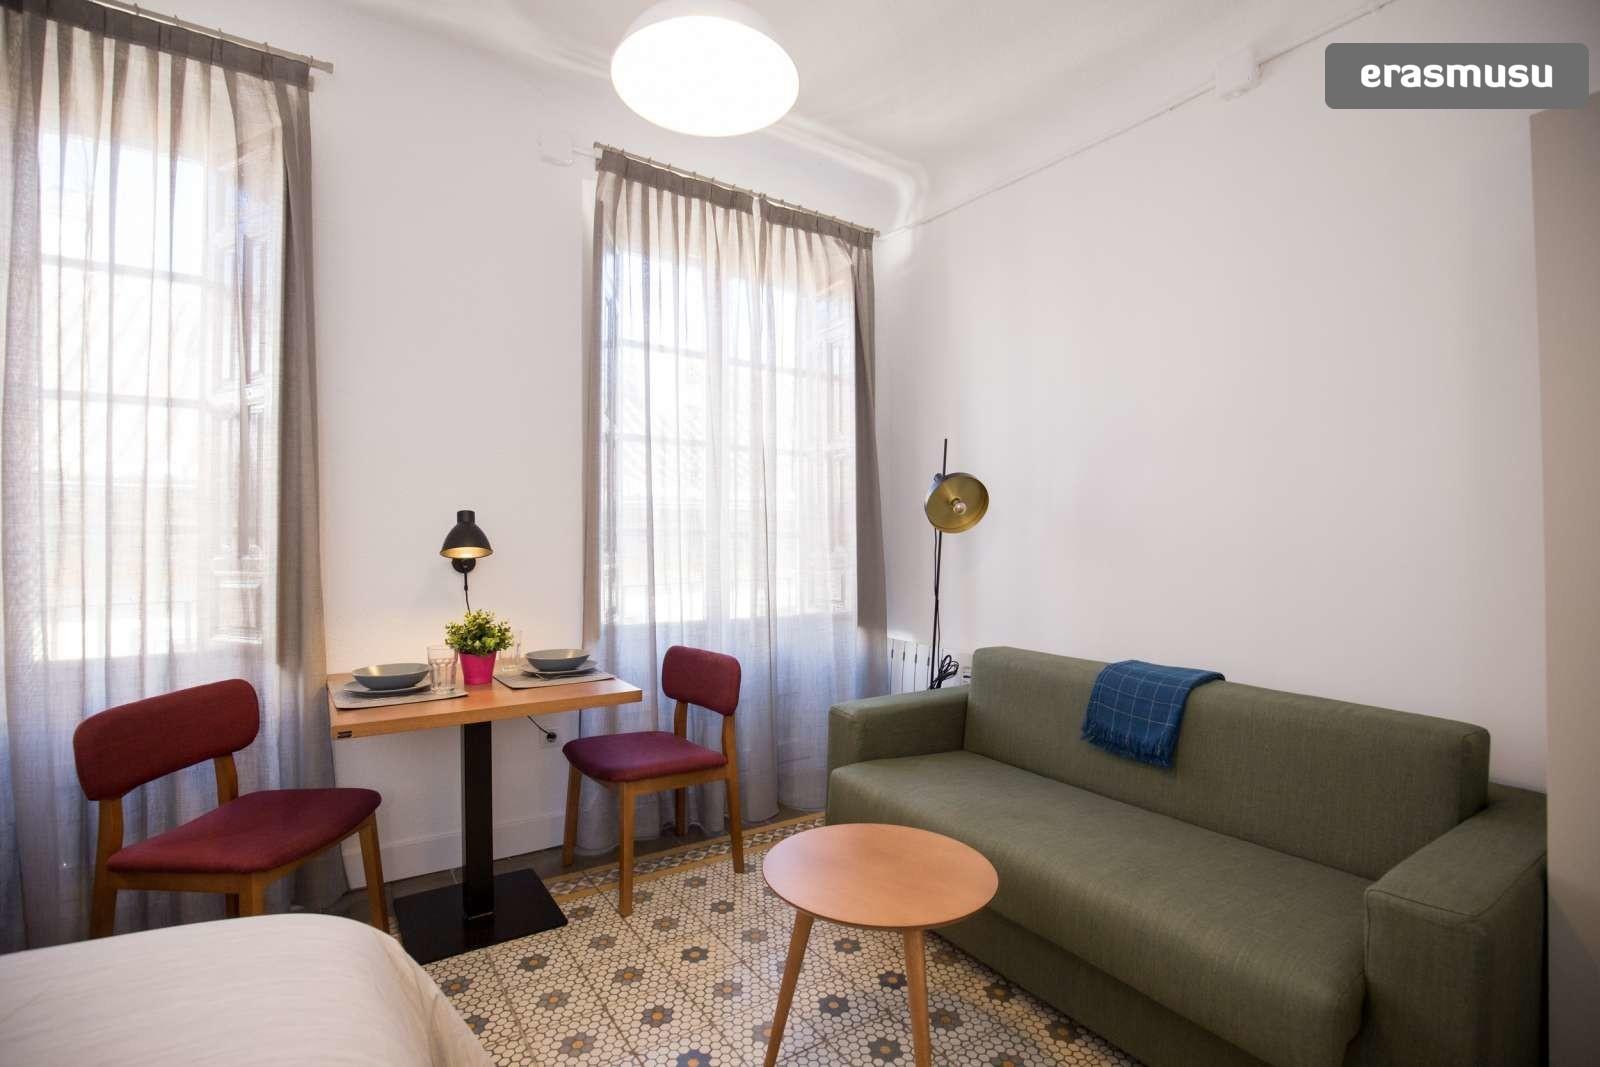 charming-studio-apartment-rent-city-centre-2d15ad356e4a375d3d28d